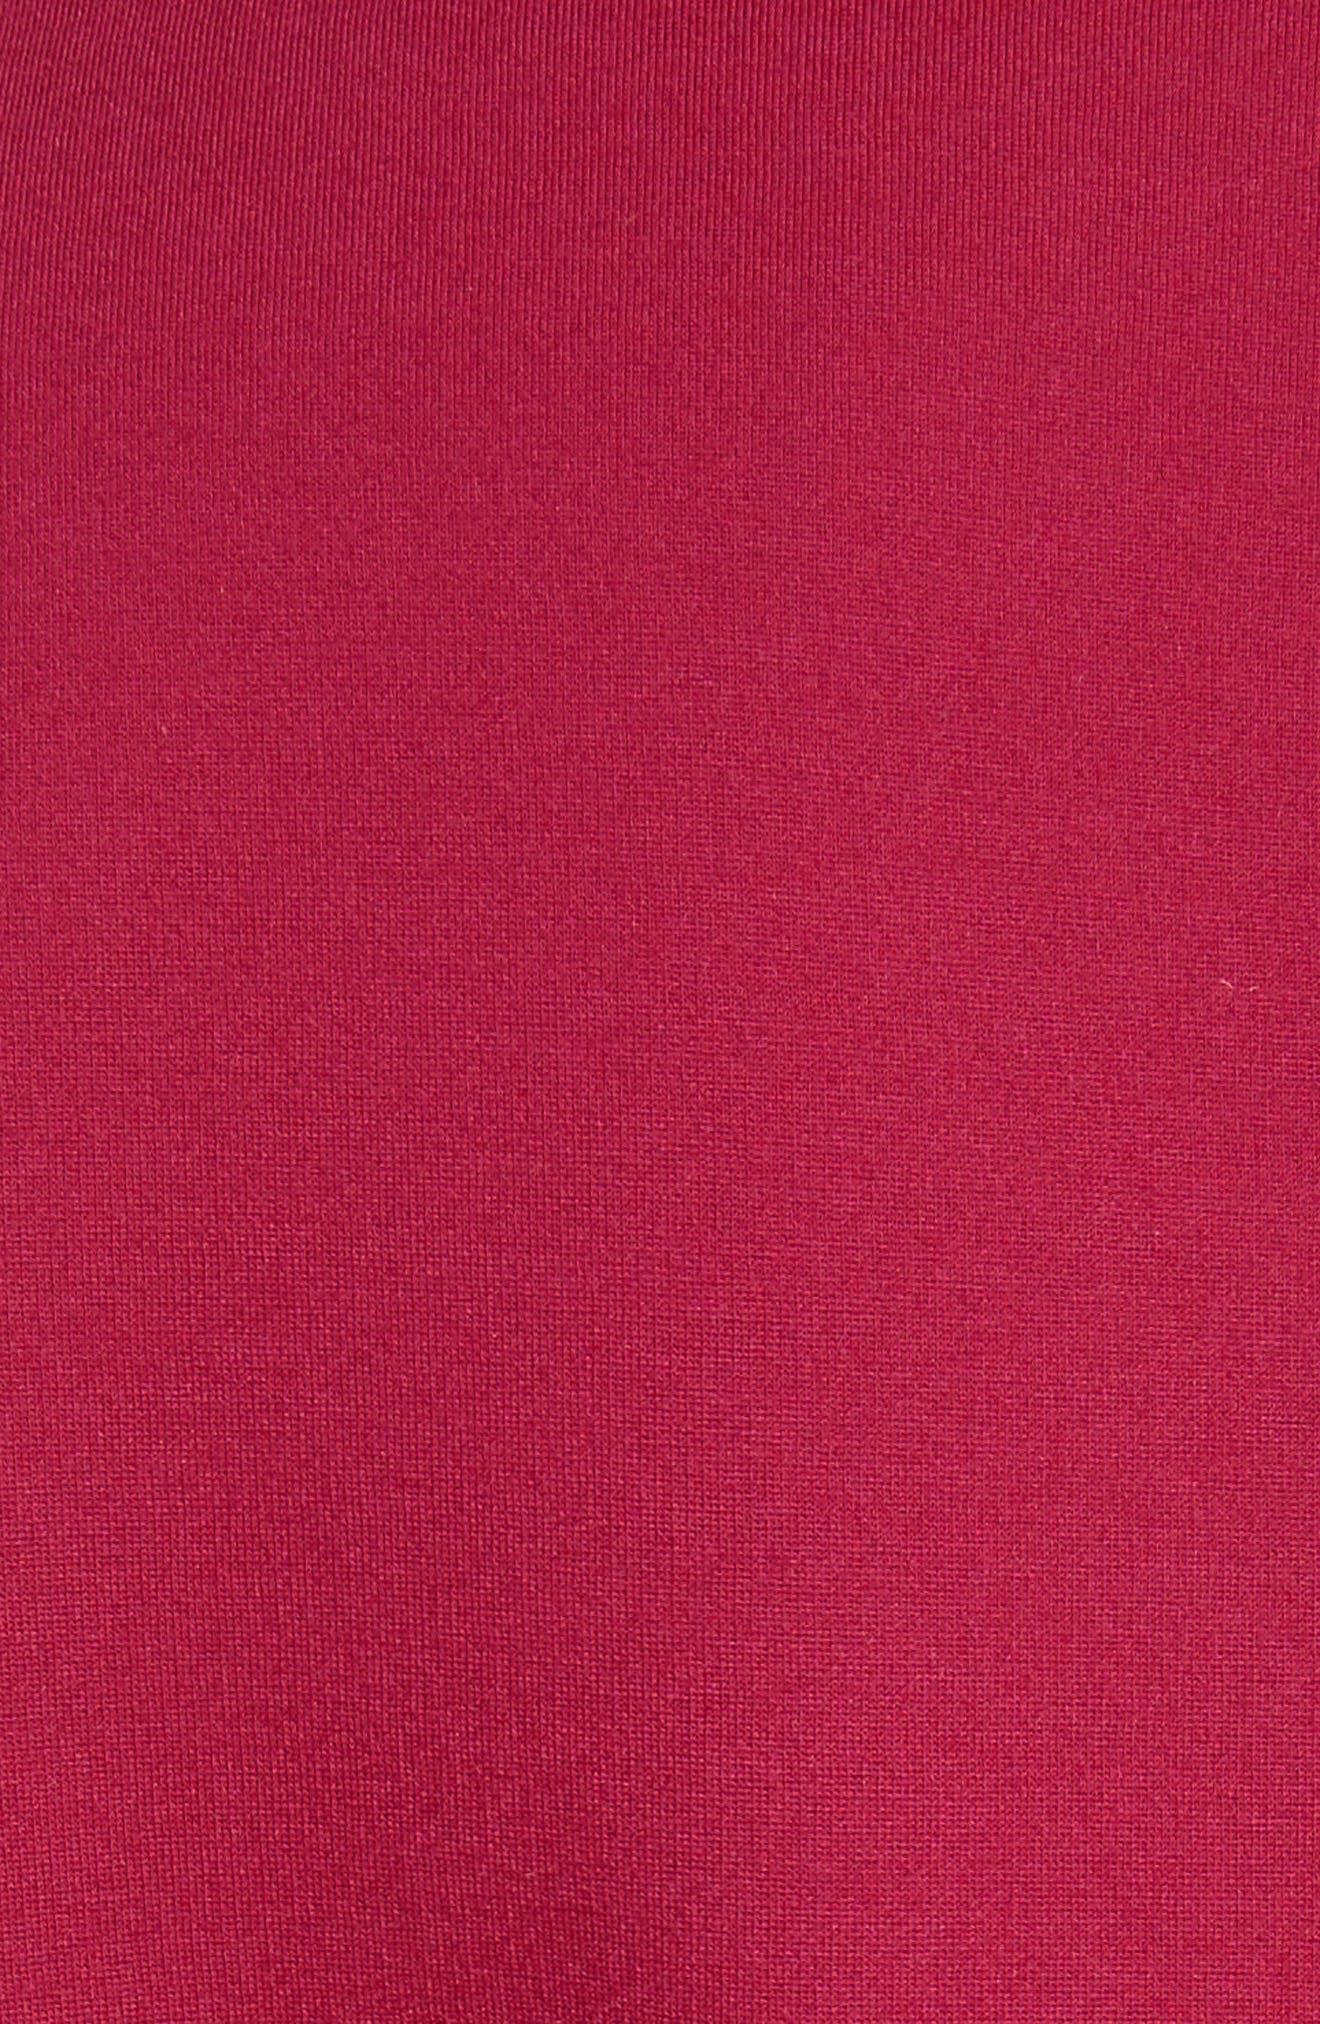 Shealah Embroidered Trim A-Line Dress,                             Alternate thumbnail 5, color,                             651